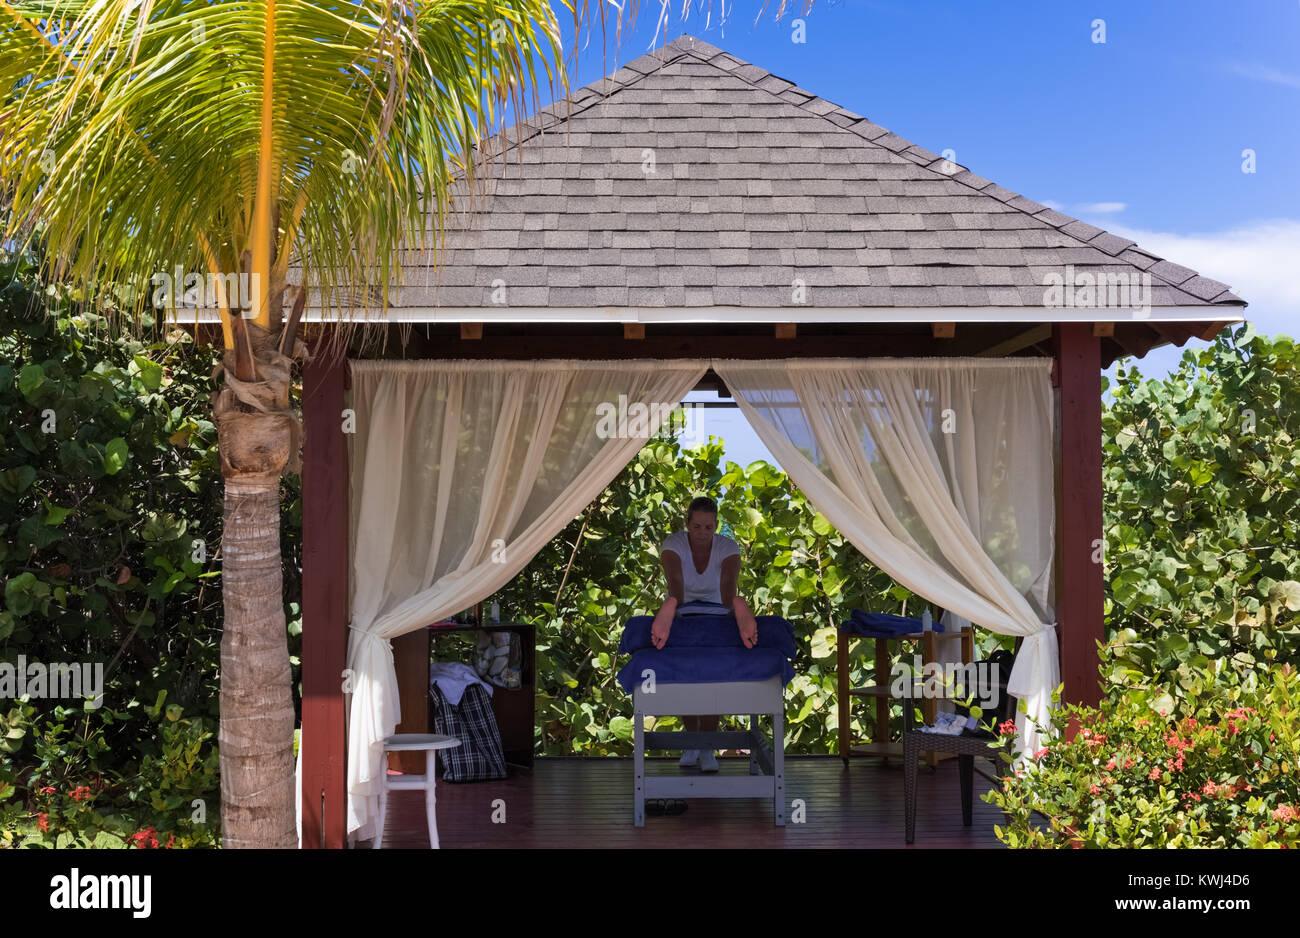 Cayo Santa Maria, Cuba - September 20, 2016: Female masseur massages a tourist - Stock Image